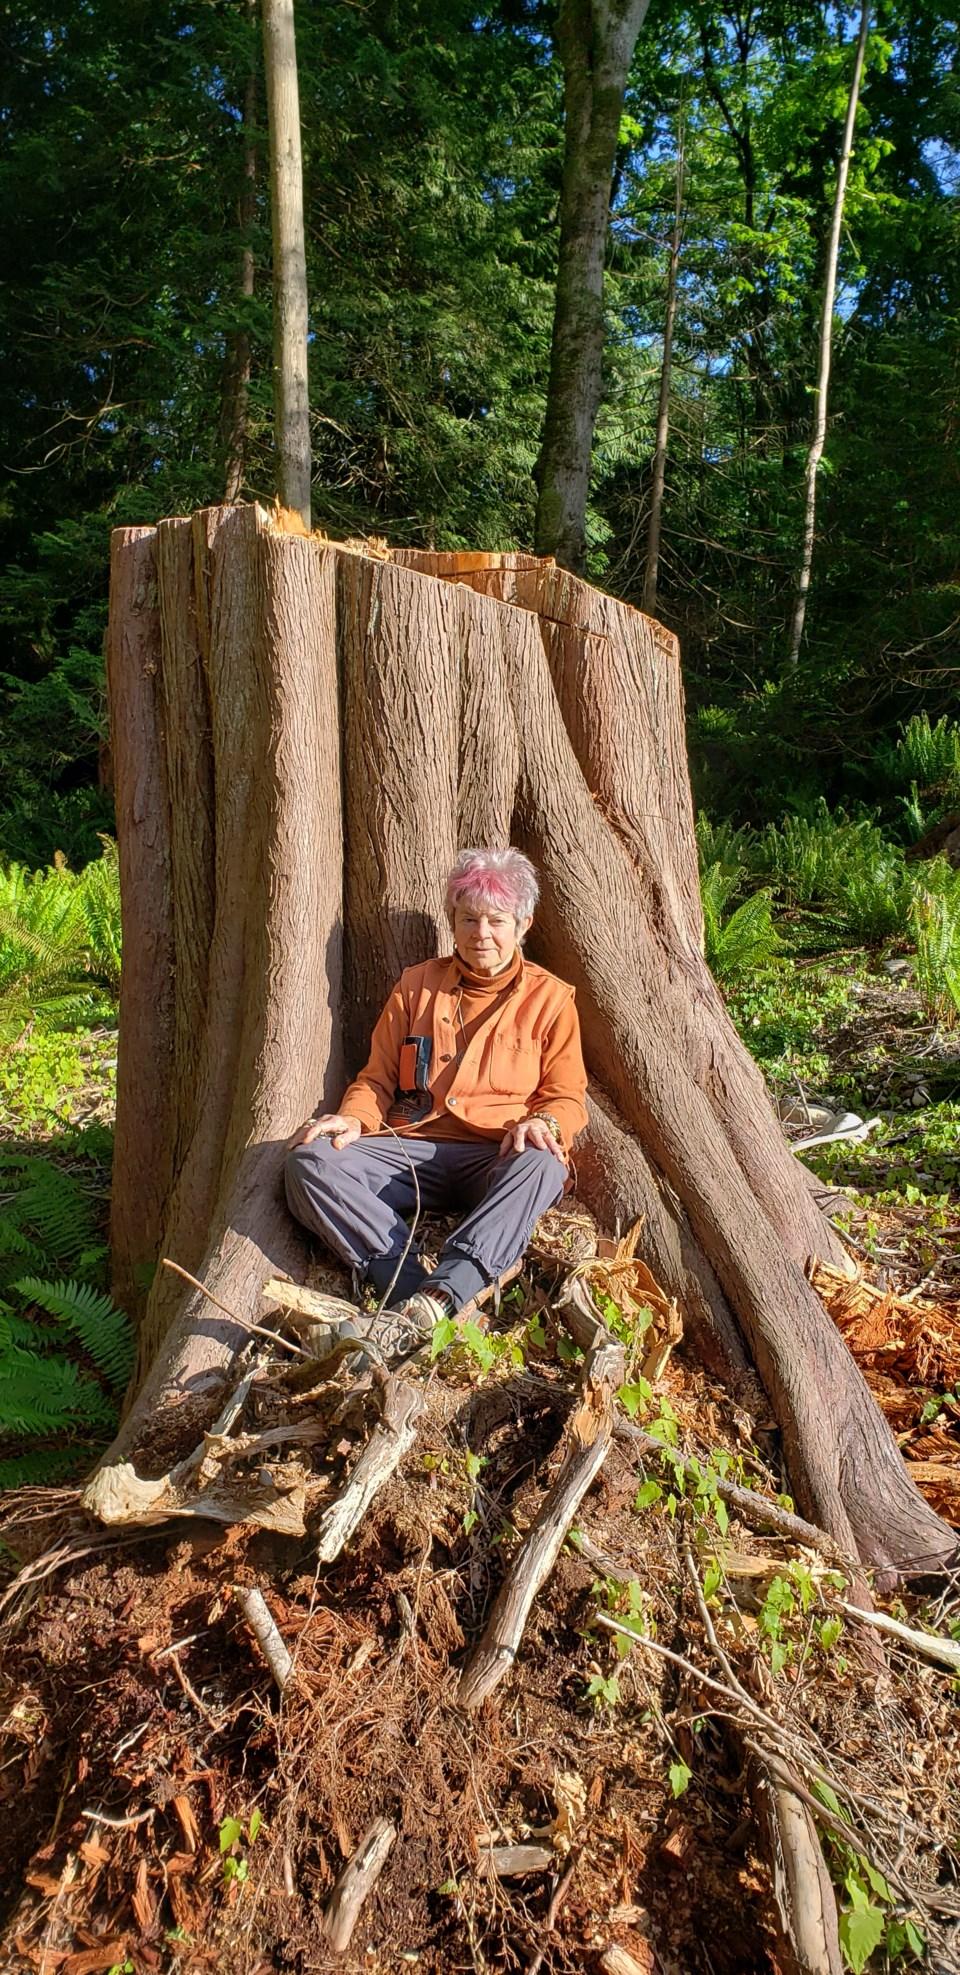 Kami sitting at the base of a tree